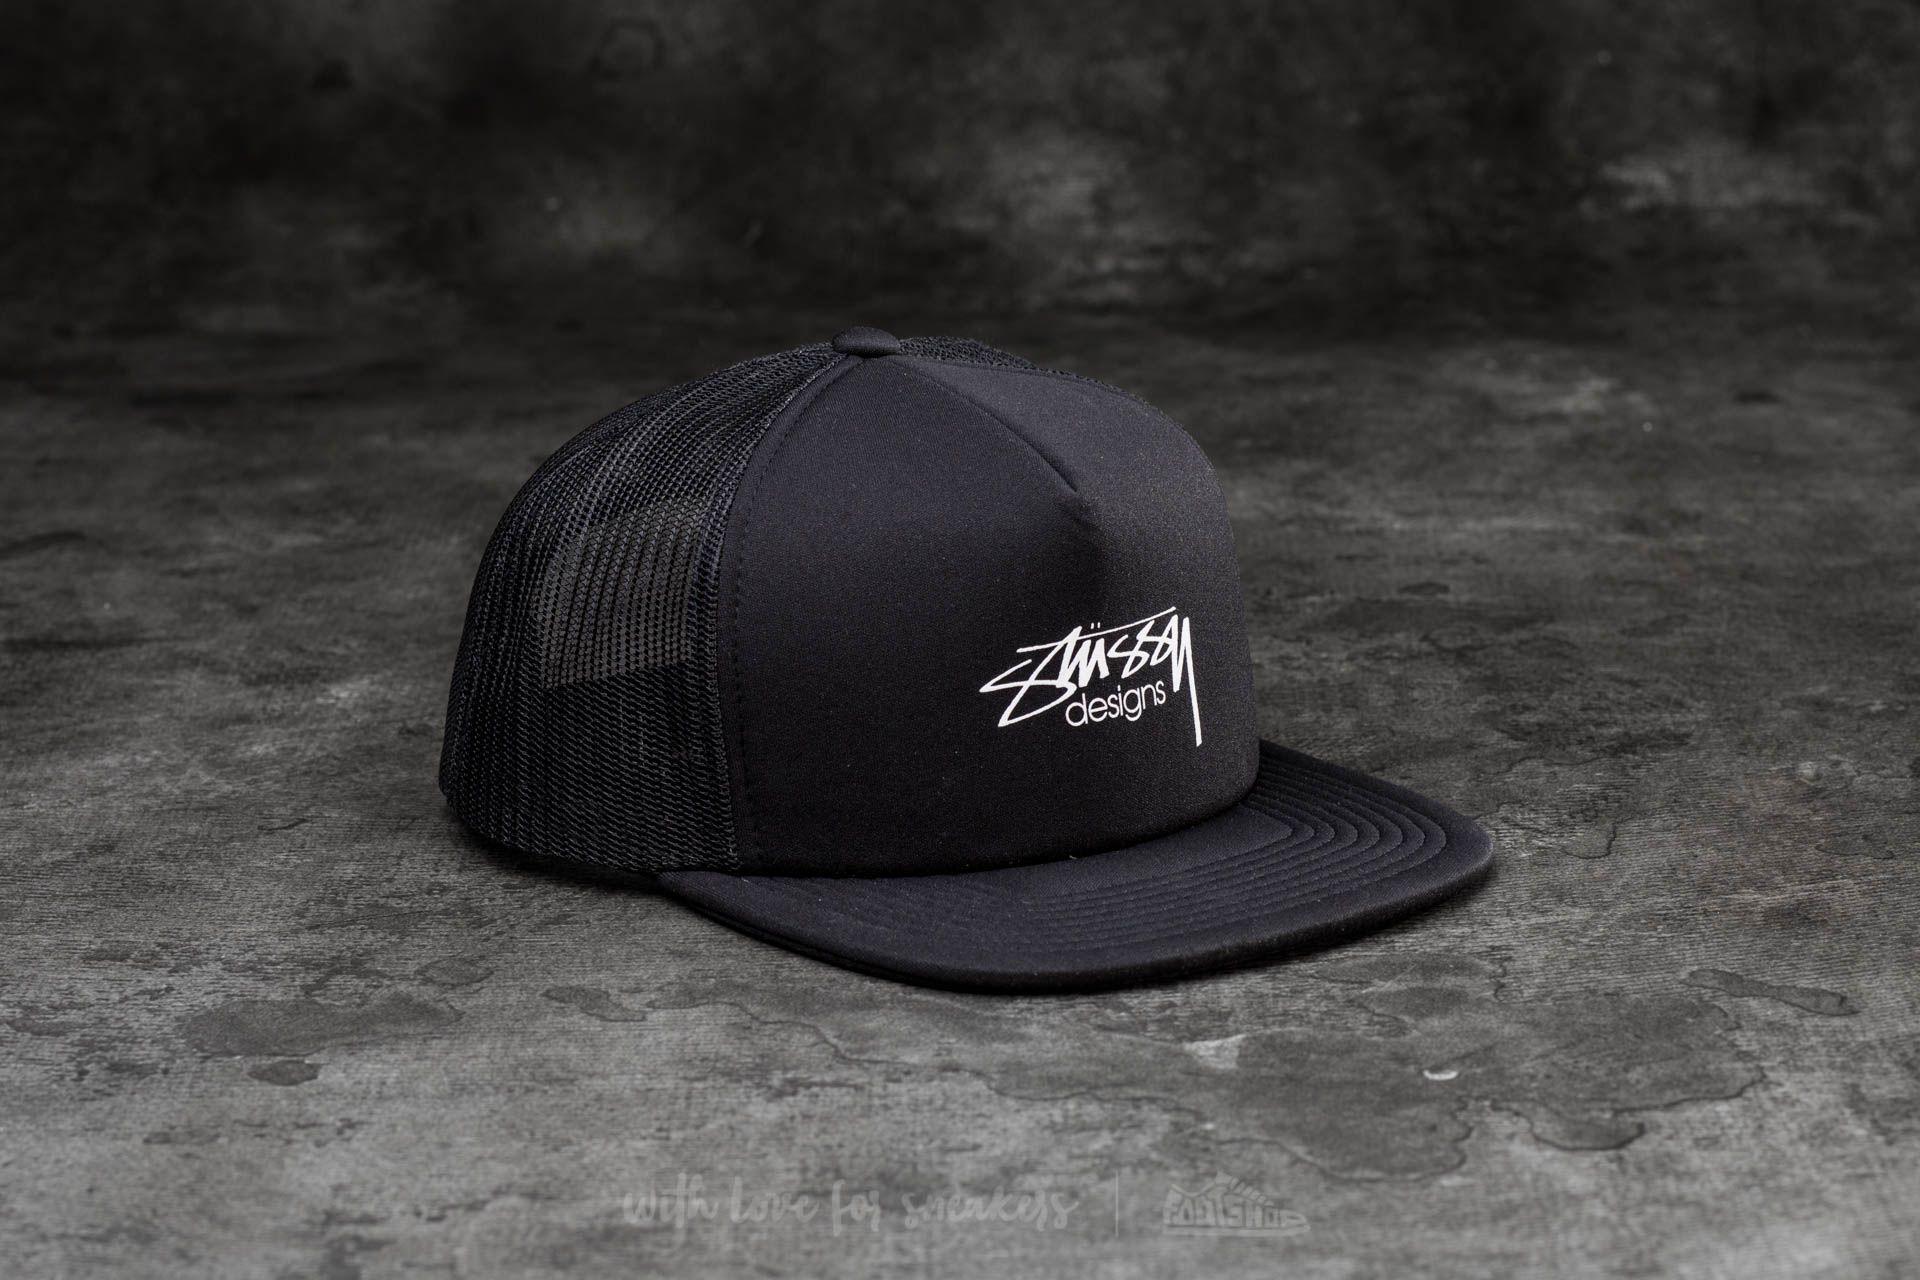 Stüssy Smooth Stock Trucker Cap Black - 15028